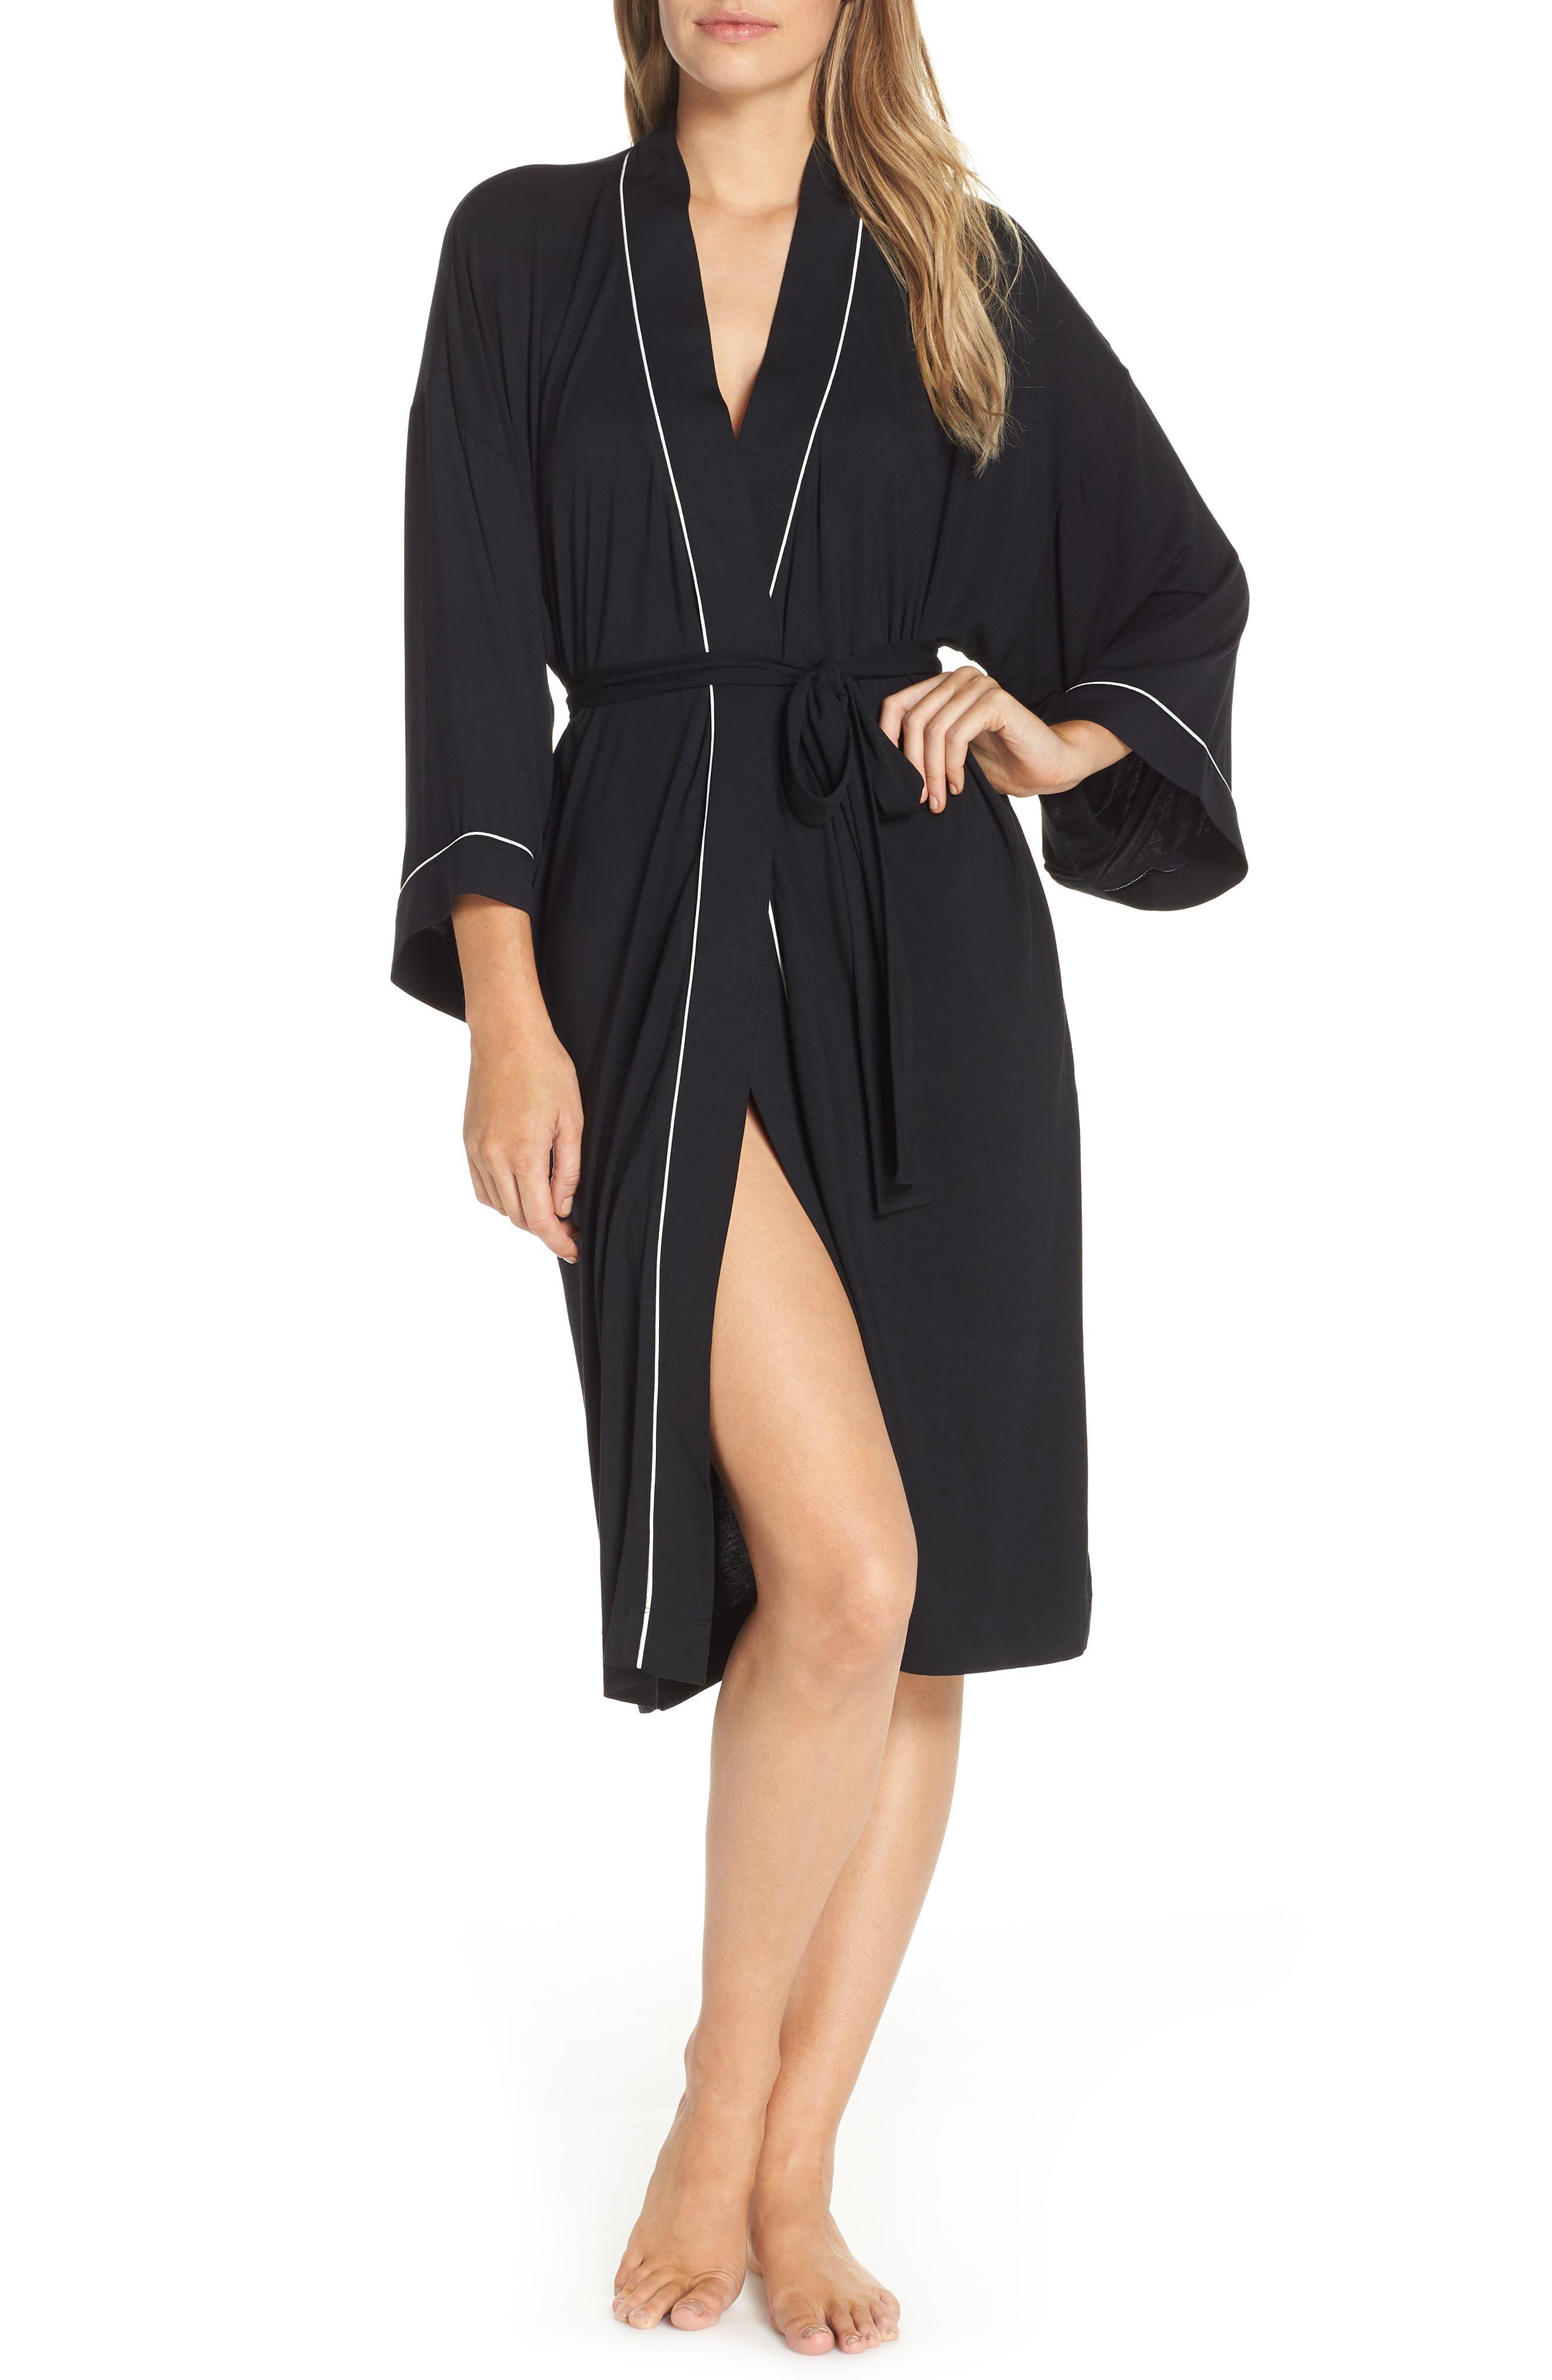 NORDSTROM LINGERIE Moonlight Jersey Robe, Main, color, 001